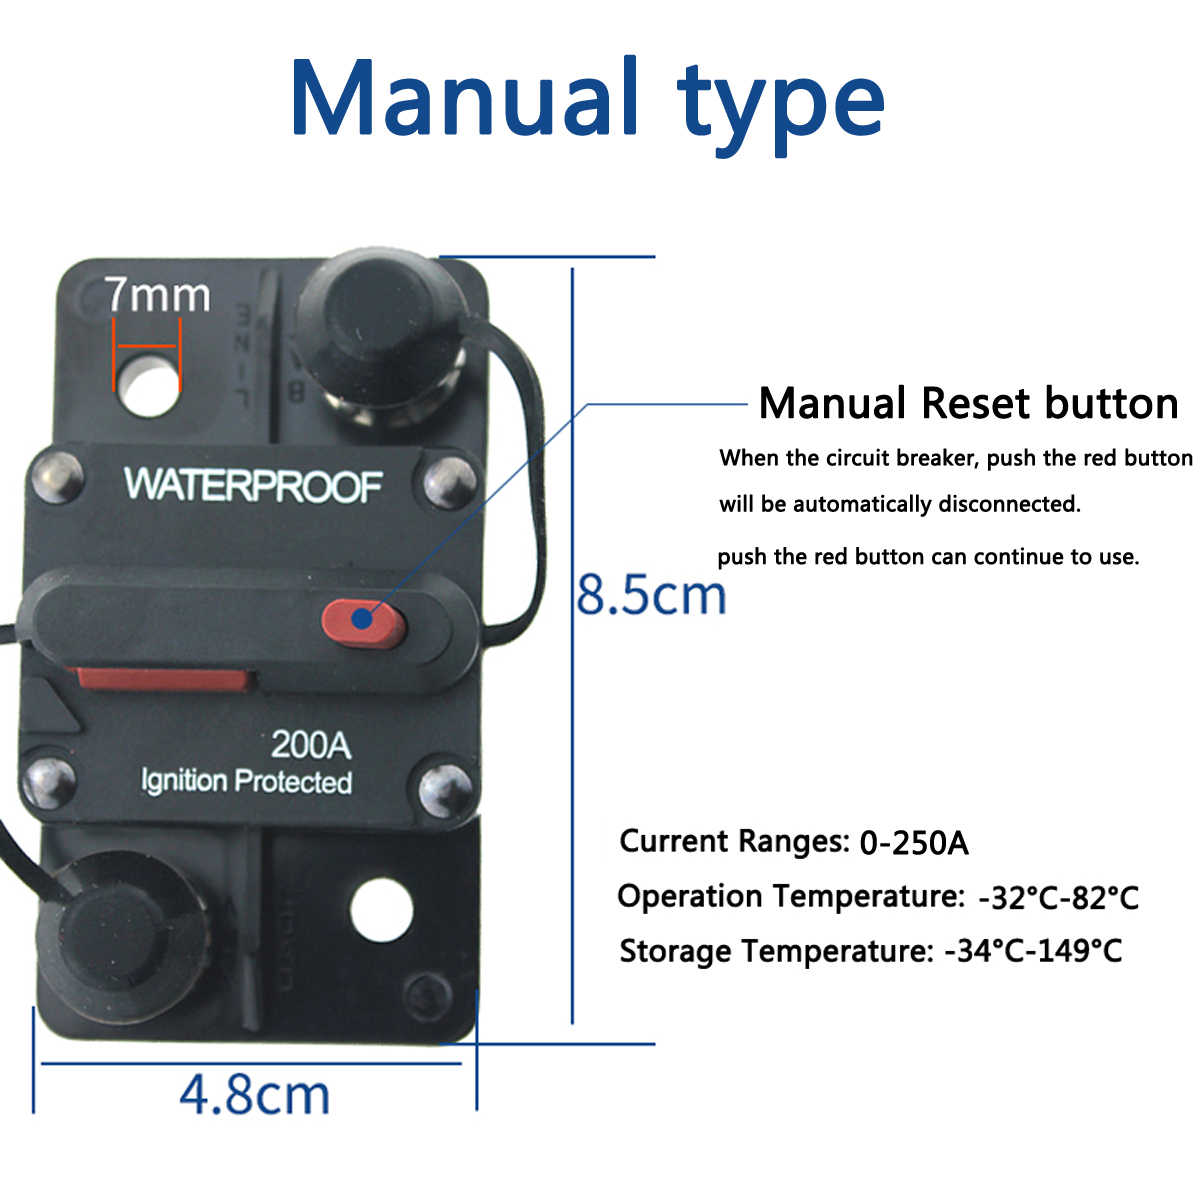 150A 140A Automobile Circuit Breaker Manual Reset Switch For 12V 24V 36V 48V Car